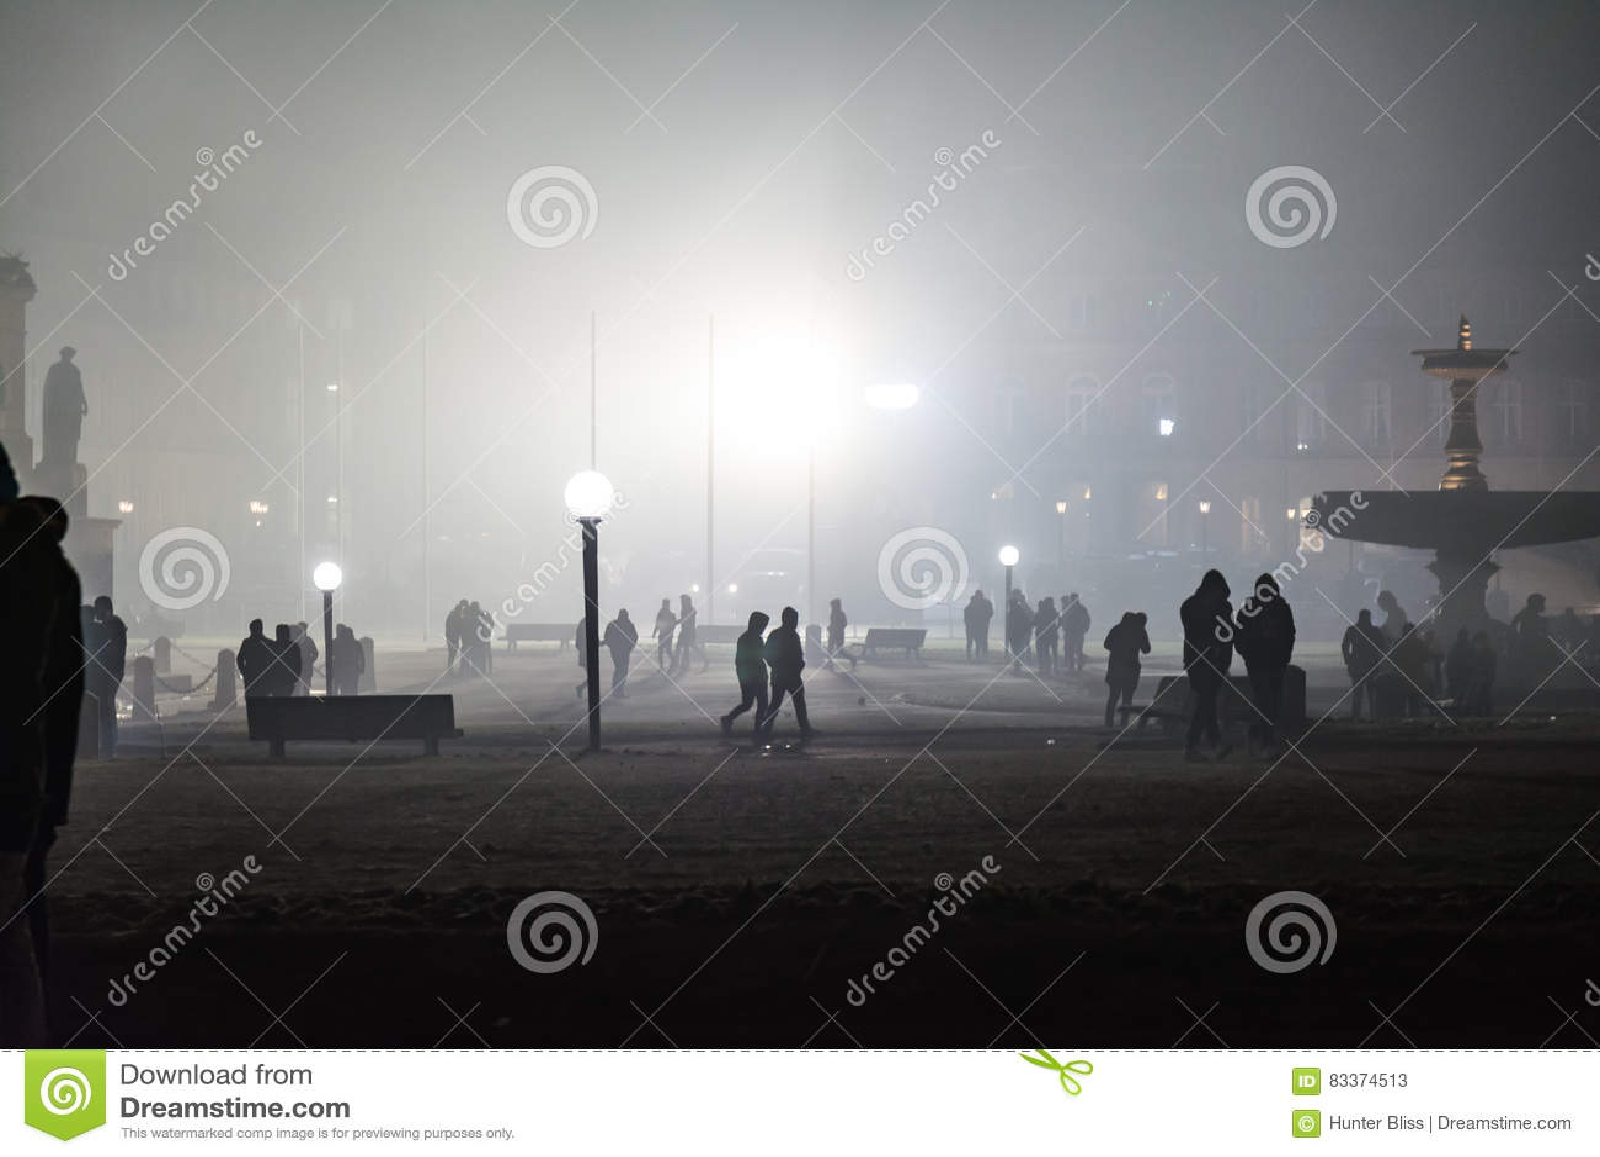 Stuttgart Fireworks Schlossplatz Smoke New Year Celebration Ominous Fog Night Spotlights Explosions Fire 2016 2017